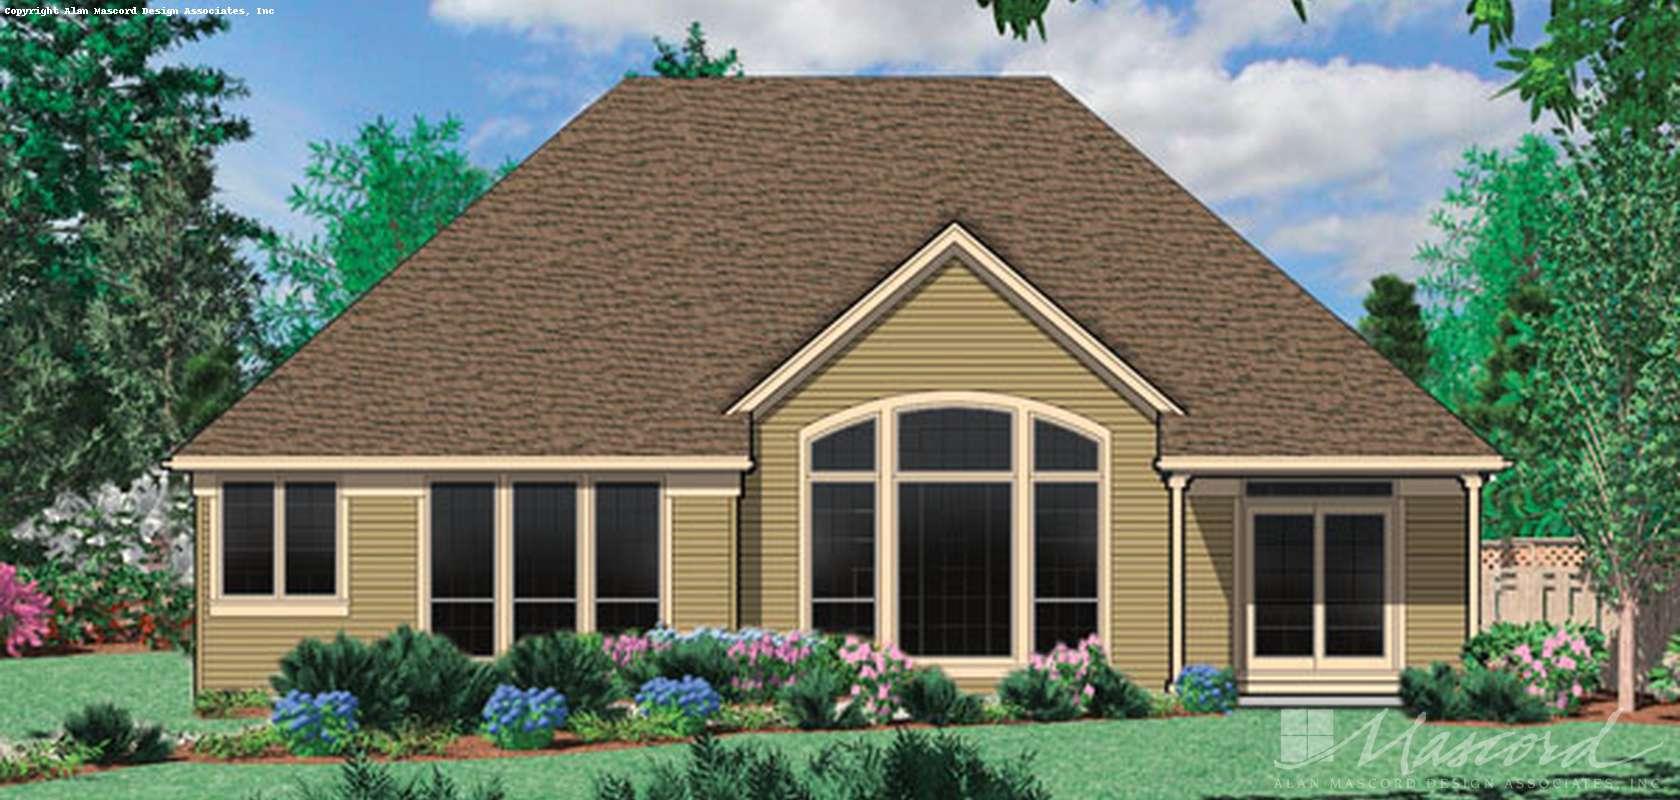 Mascord House Plan B1150A: The Calloway